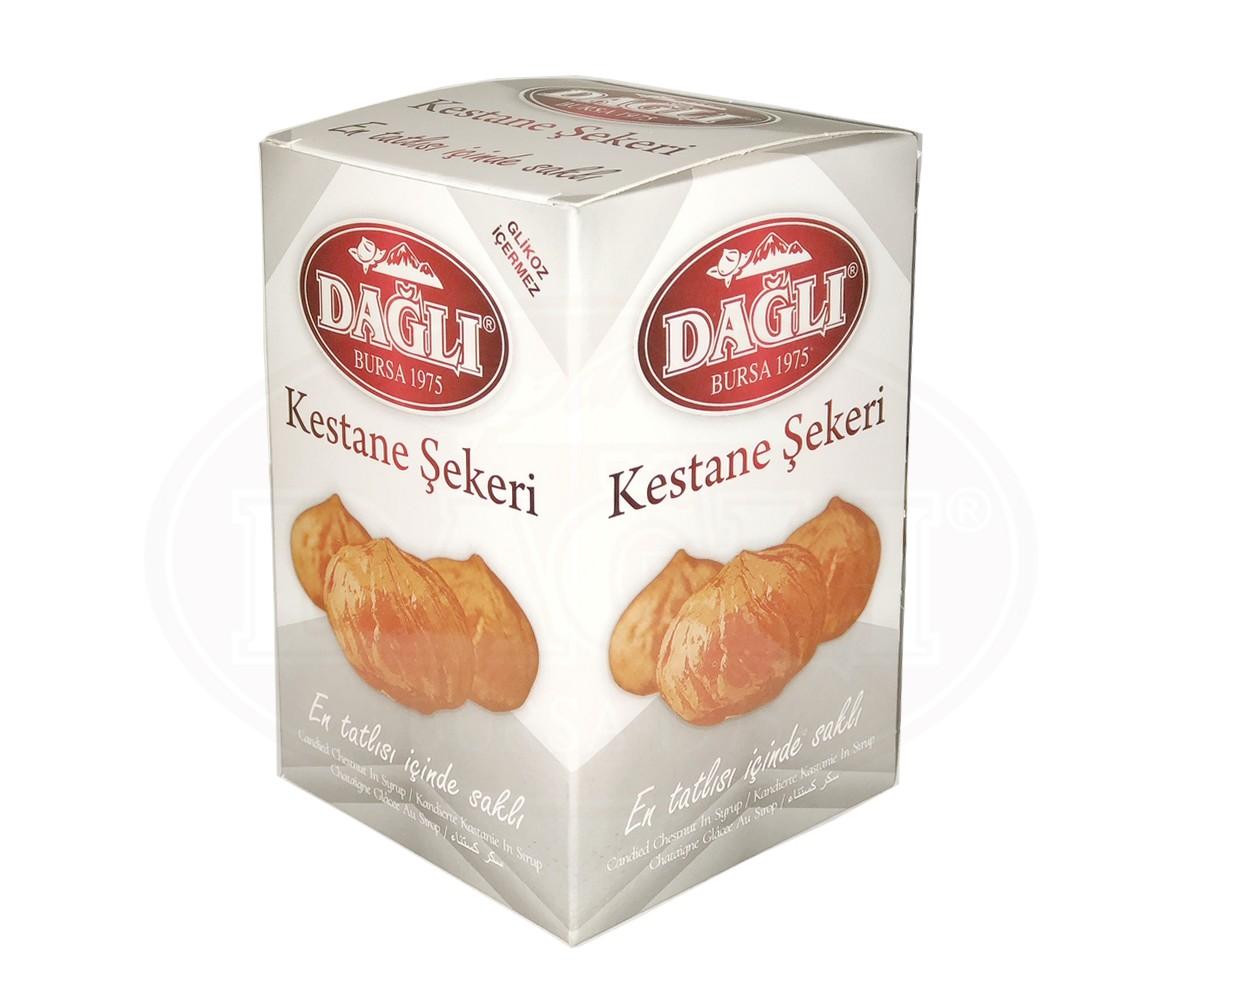 Şuruplu Kavanoz Kestane Şekeri 850g